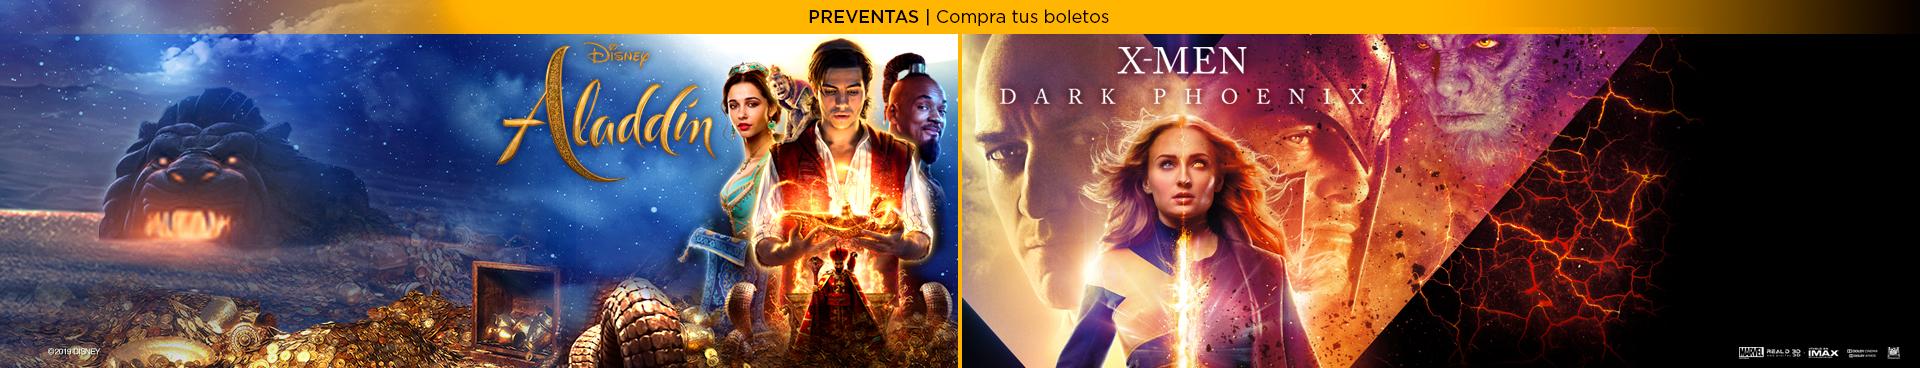 Preventas: Aladdín / X-Men Dark Phoenix